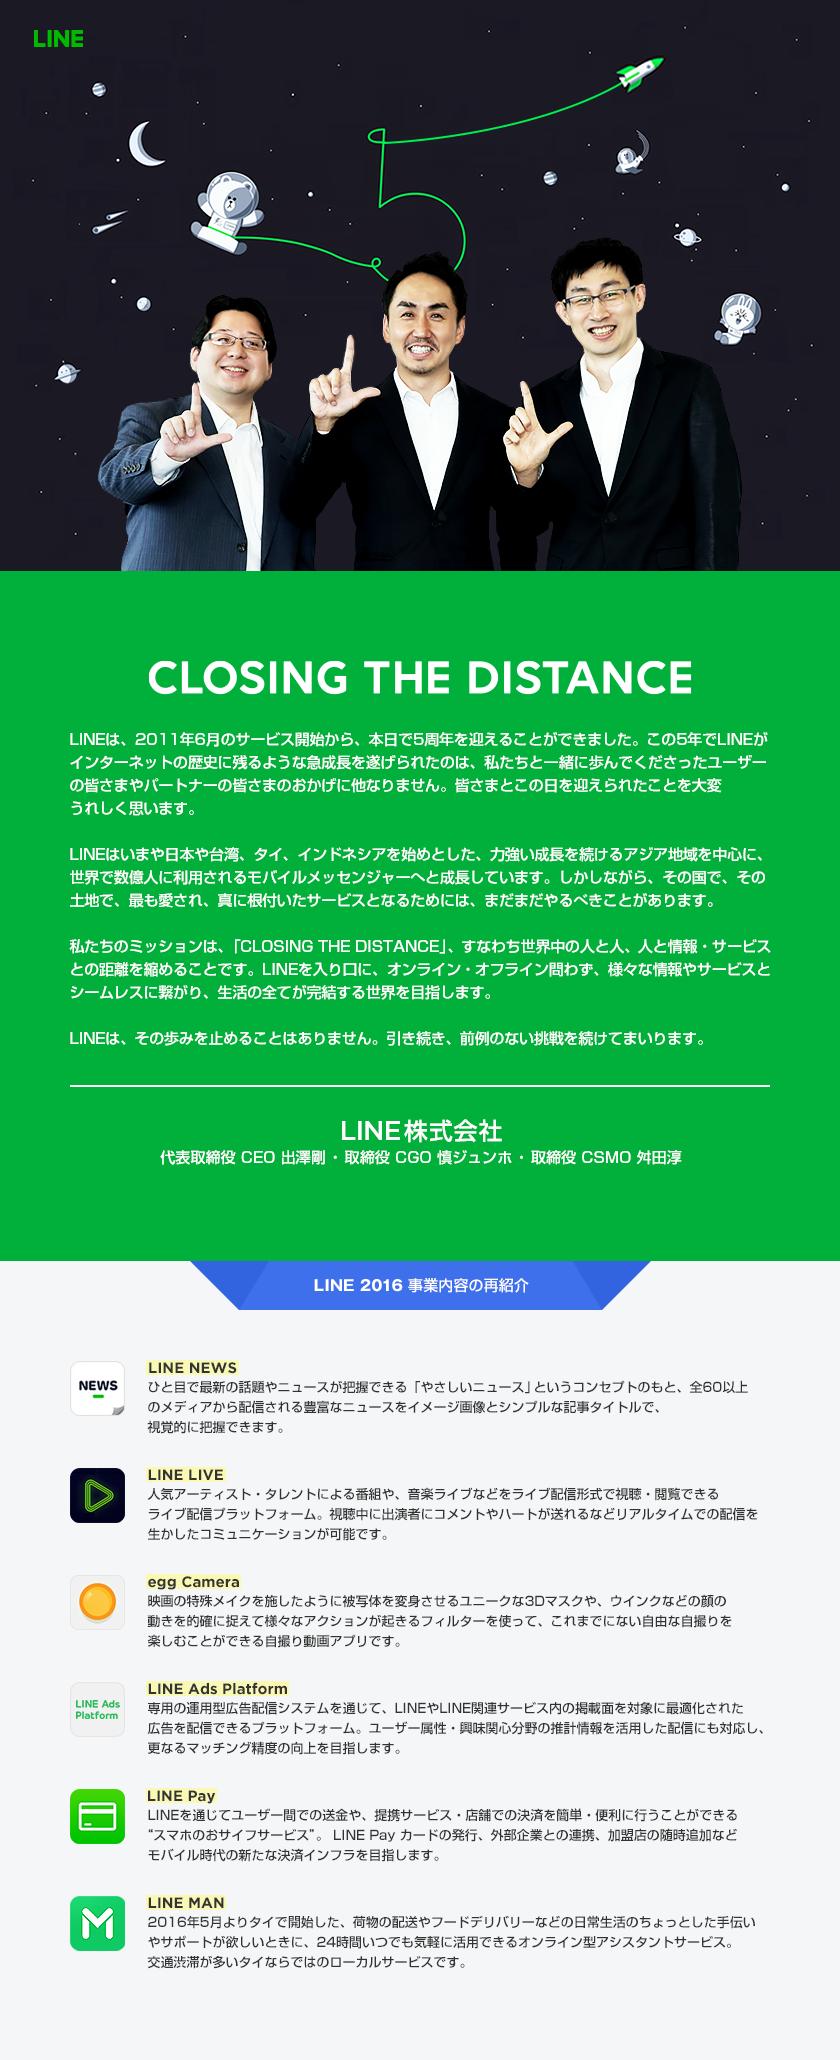 /linecorp/ja/pr/5th_Anniversary_Letter(JP)_2.png